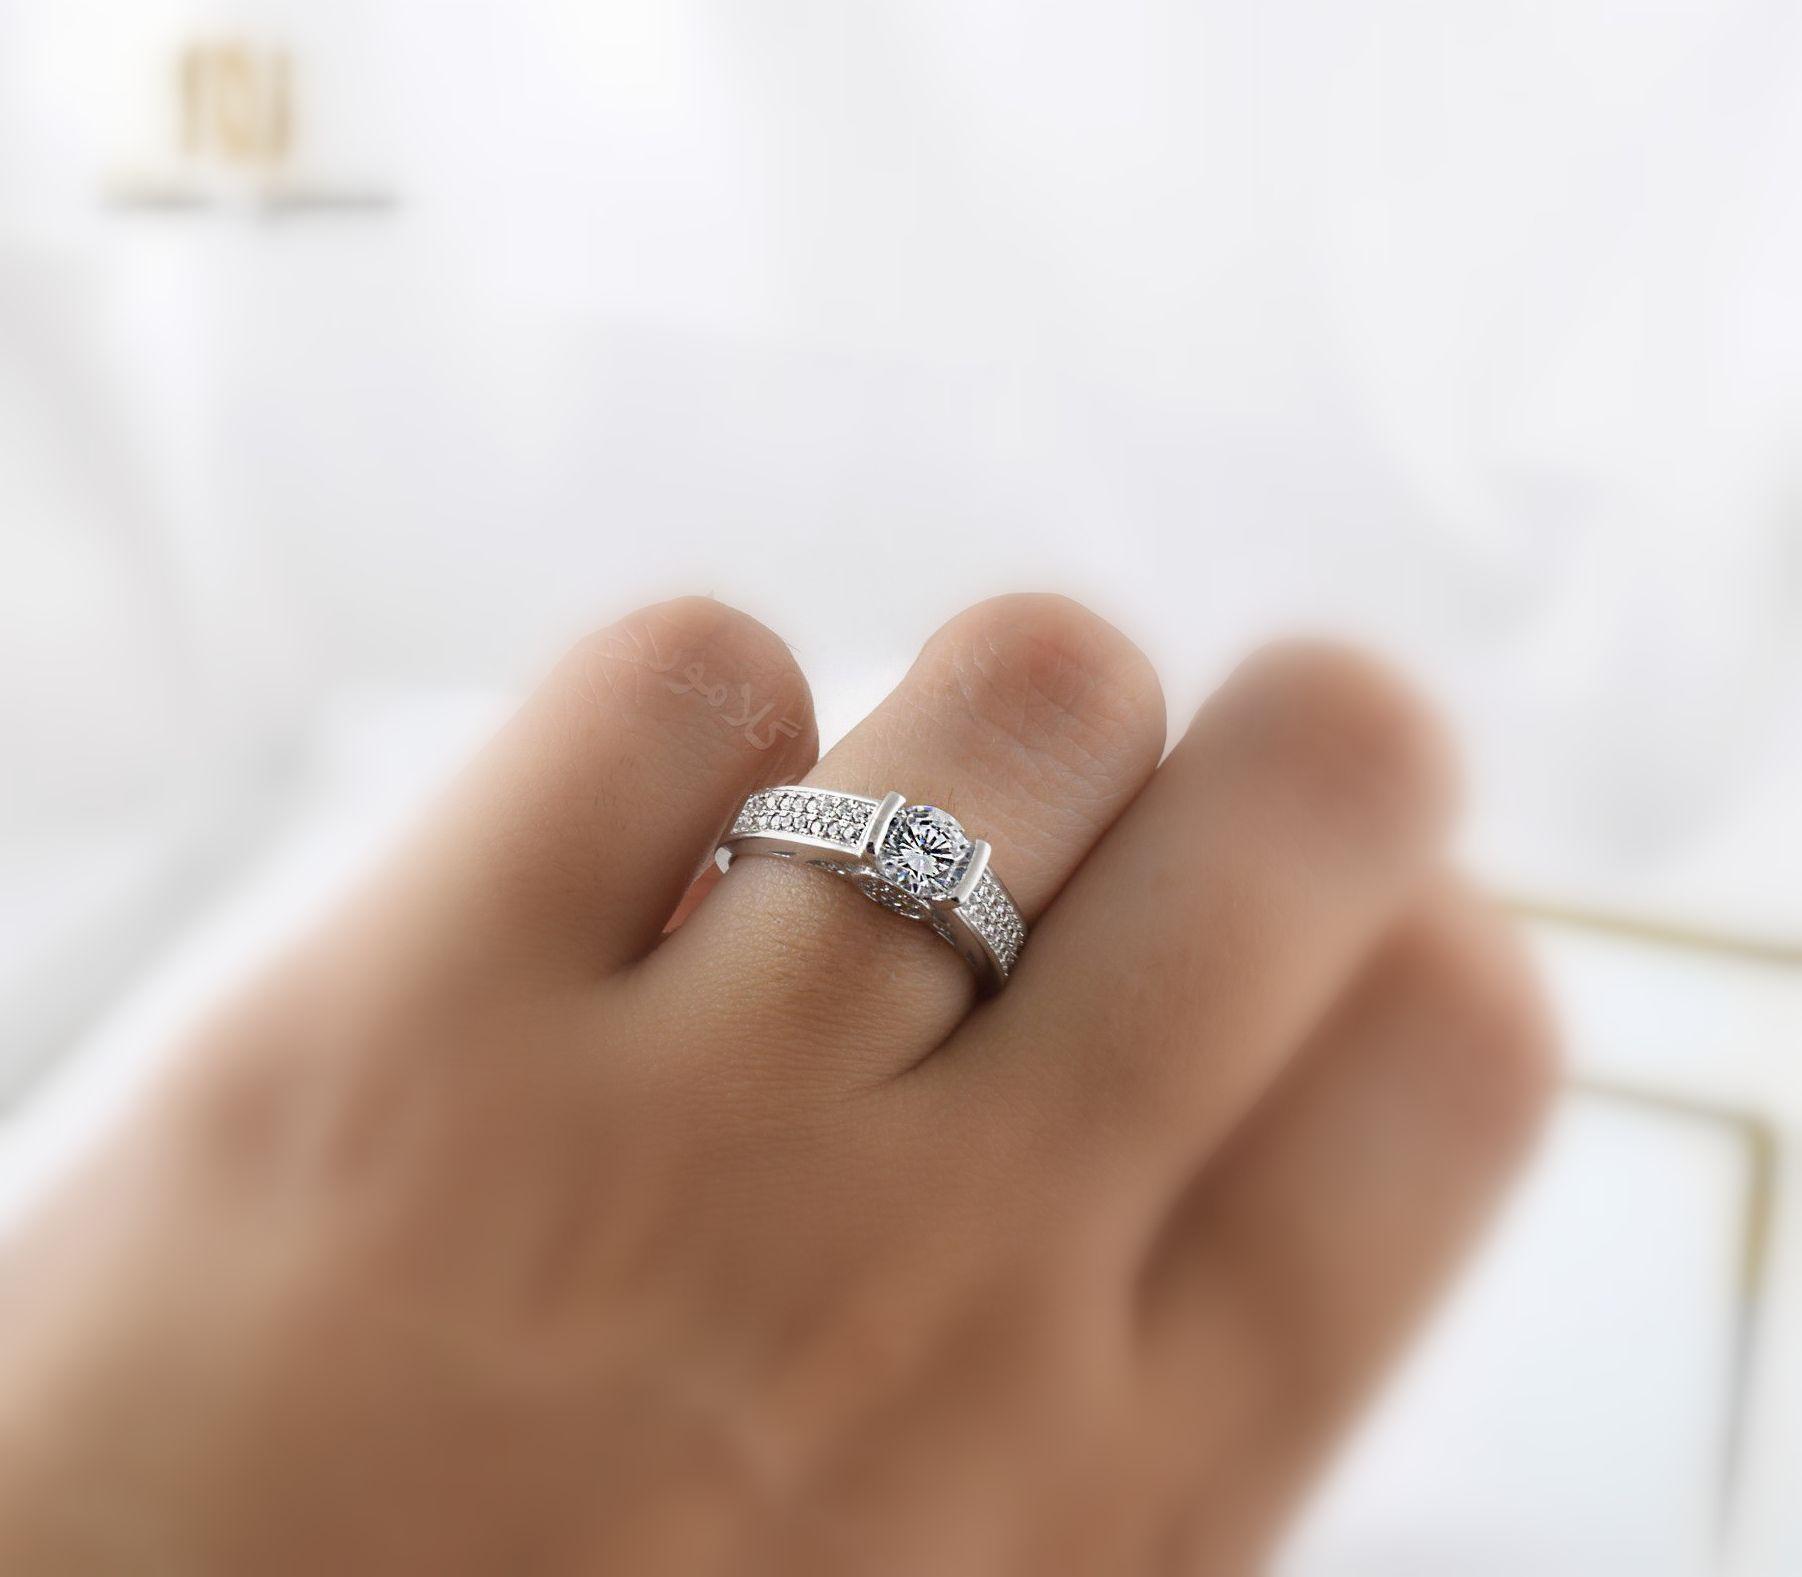 انگشتر نقره زنانه لوکس با تاج سه بعدی Rg-n234 (2)